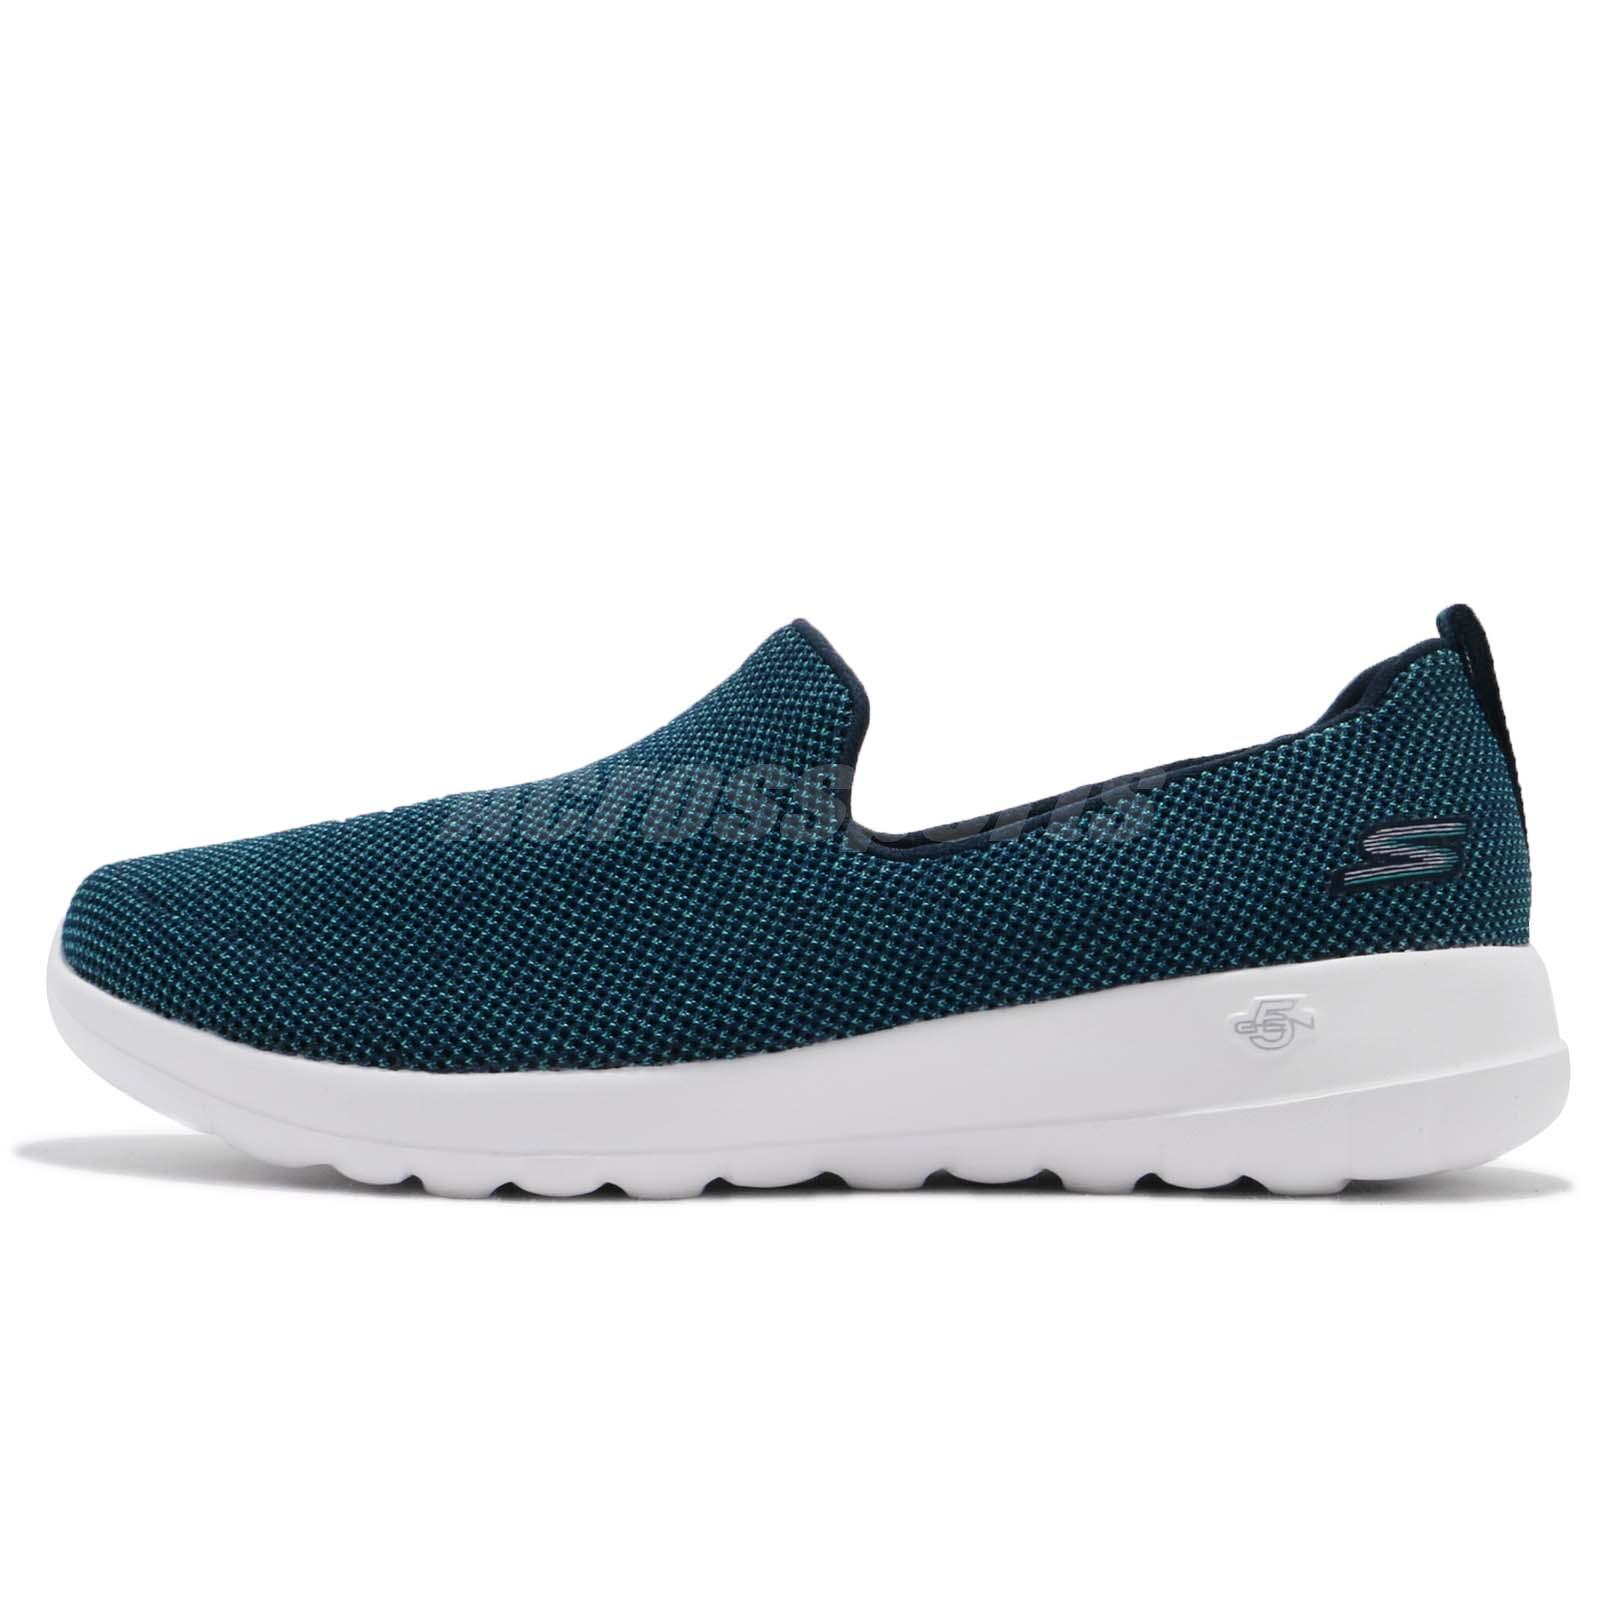 7768498ba75 Skechers Go Walk Joy Activate Teal Navy Women Walking Shoes Slip-on  15609-NVTL